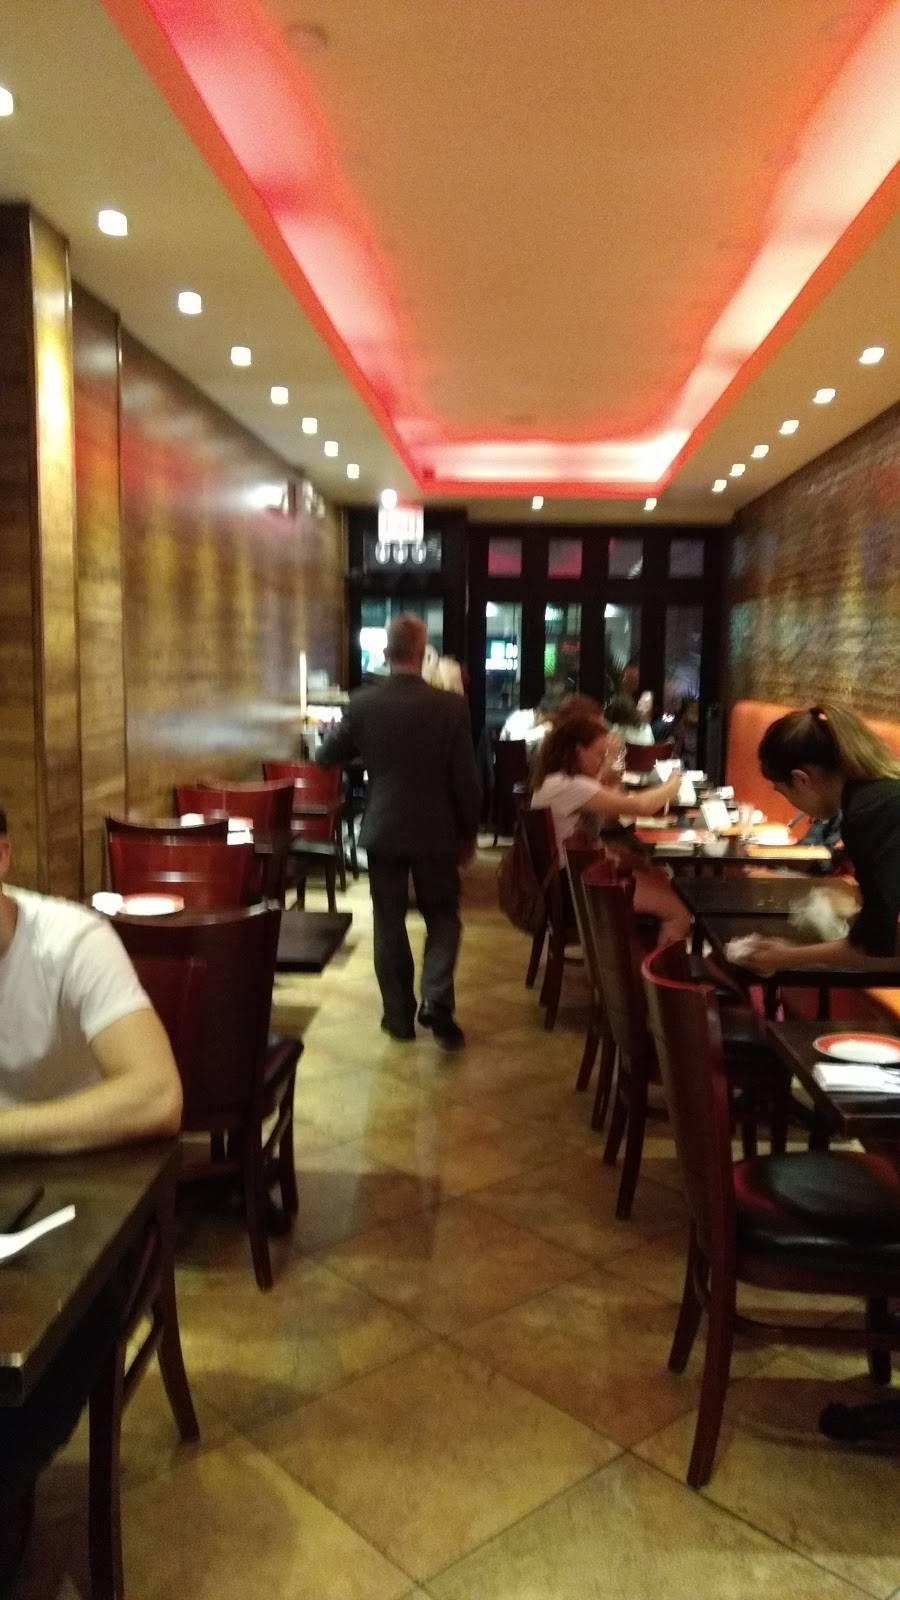 Spice Saigon   restaurant   1237 1st Avenue, New York, NY 10065, USA   2126280088 OR +1 212-628-0088